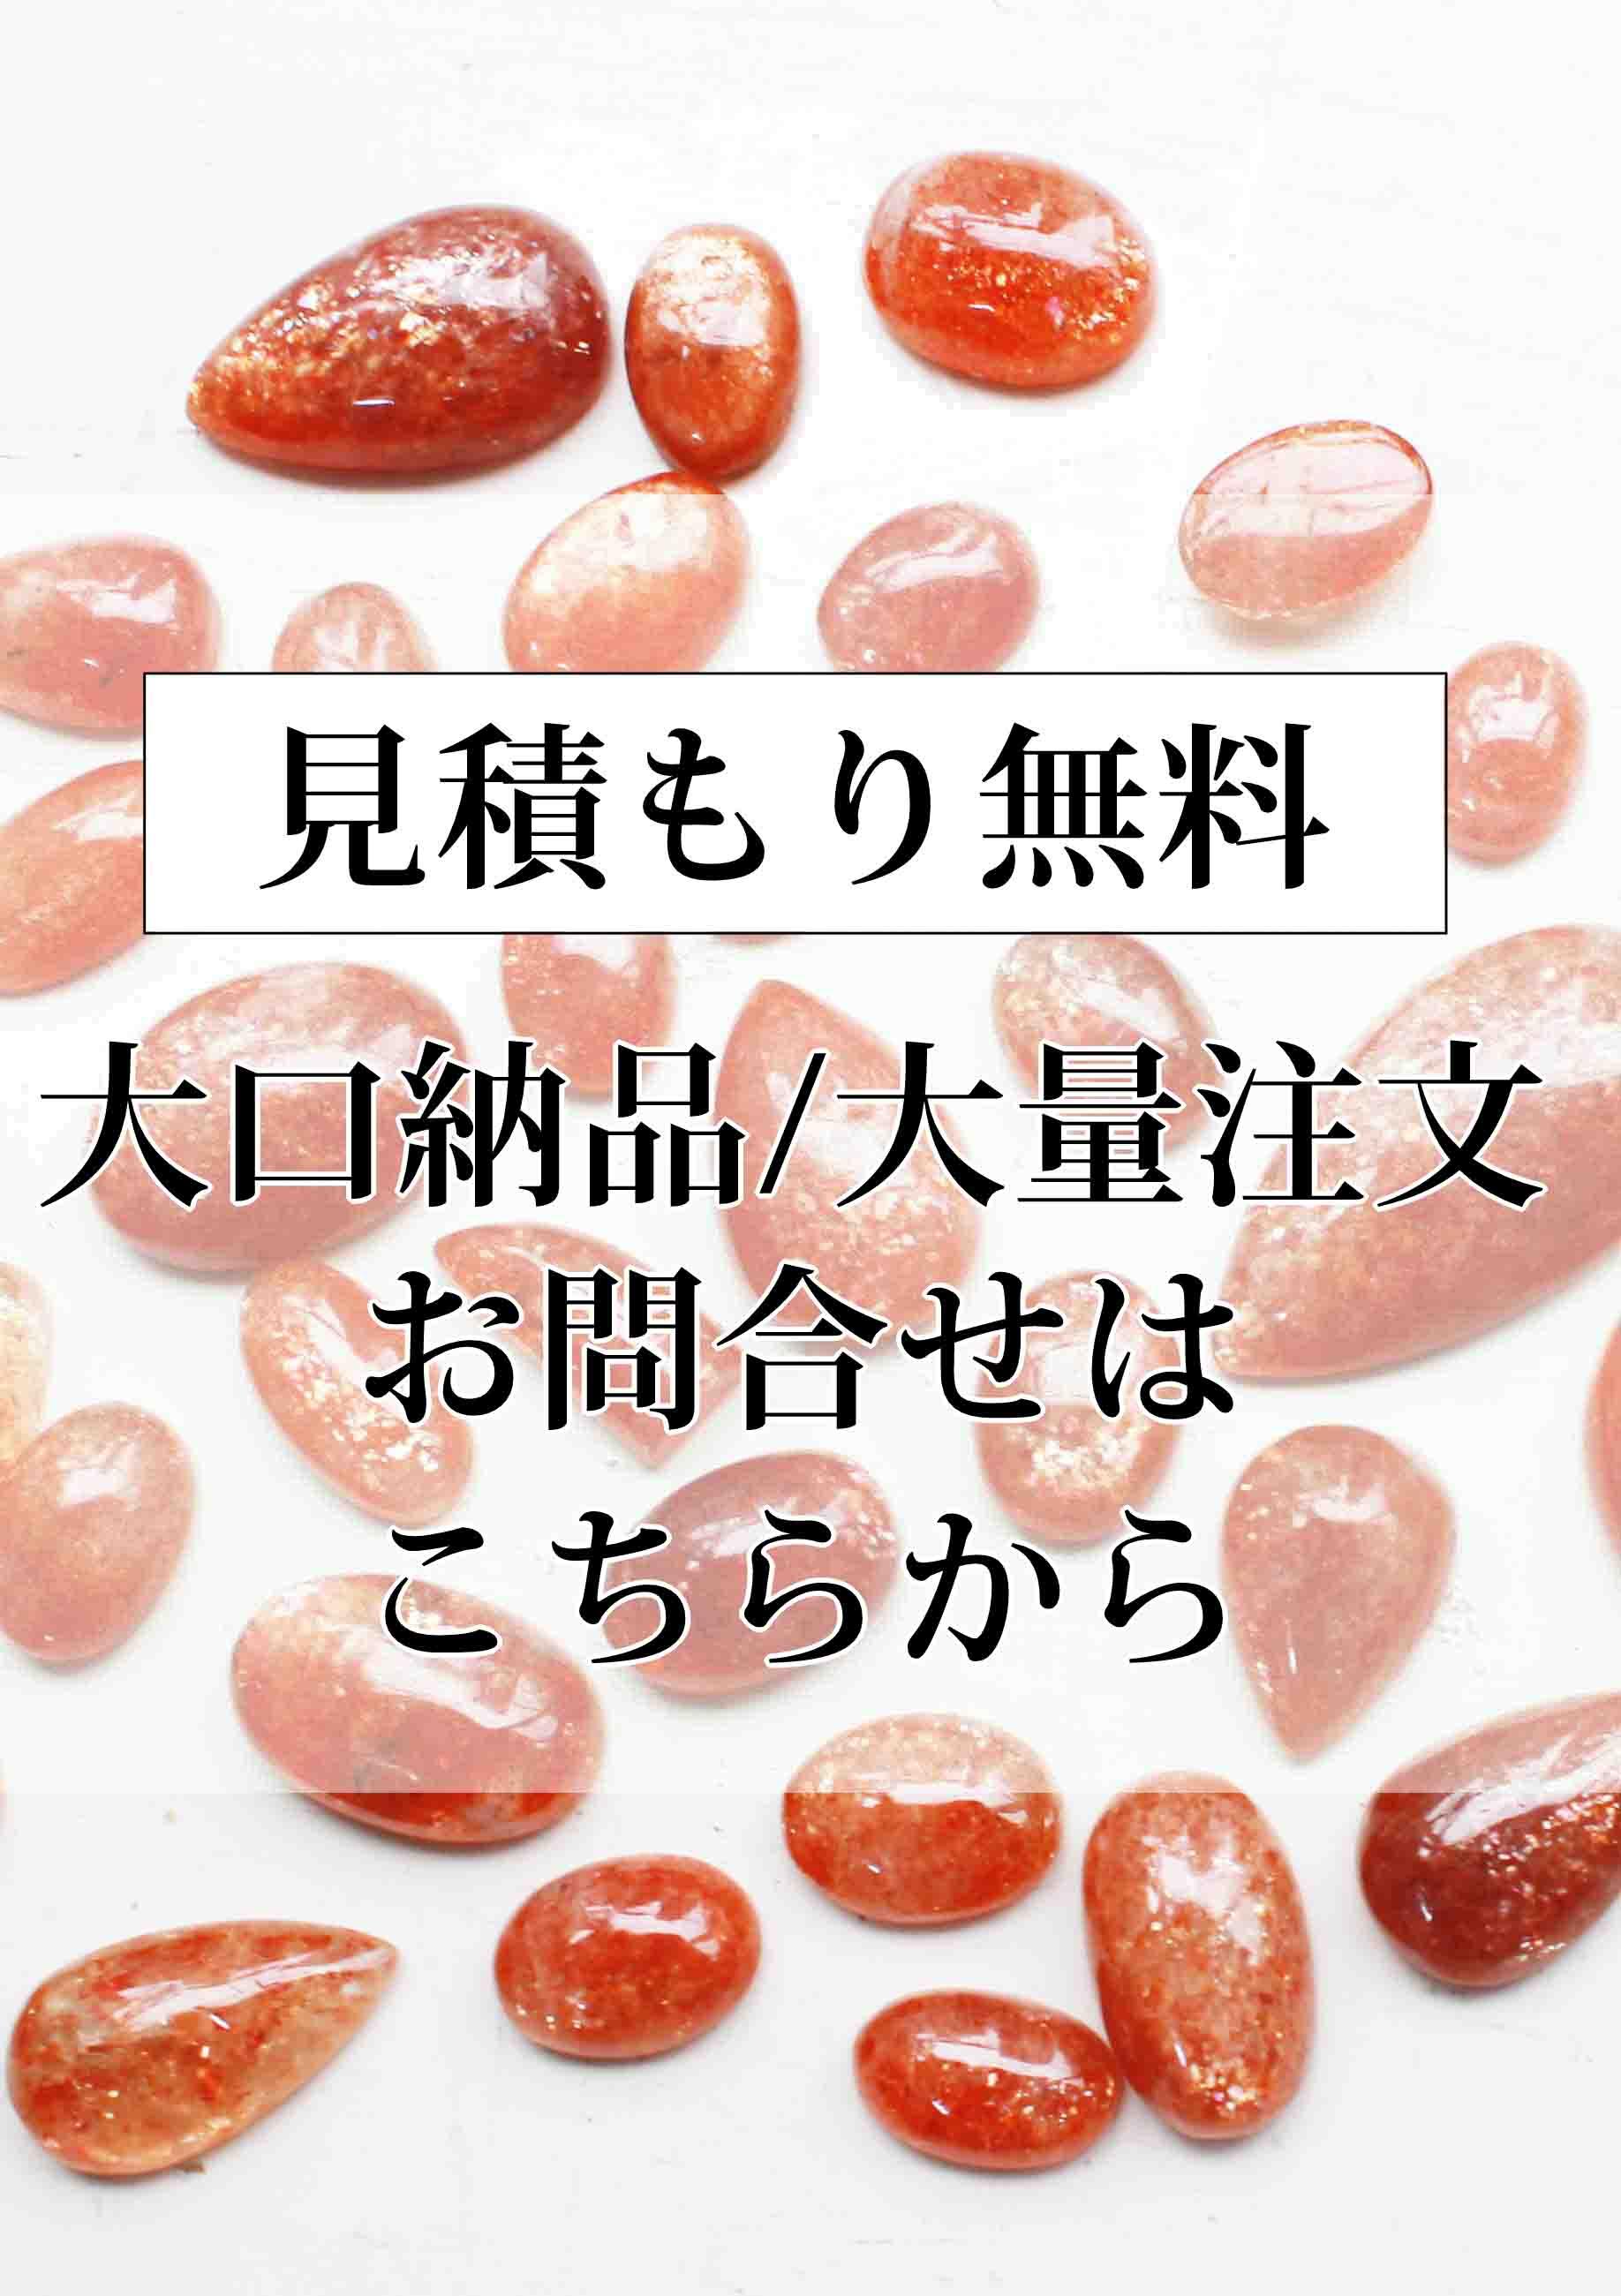 https://www.stoneclub.jp/data/stoneclub/image/IMG_5995.JPG